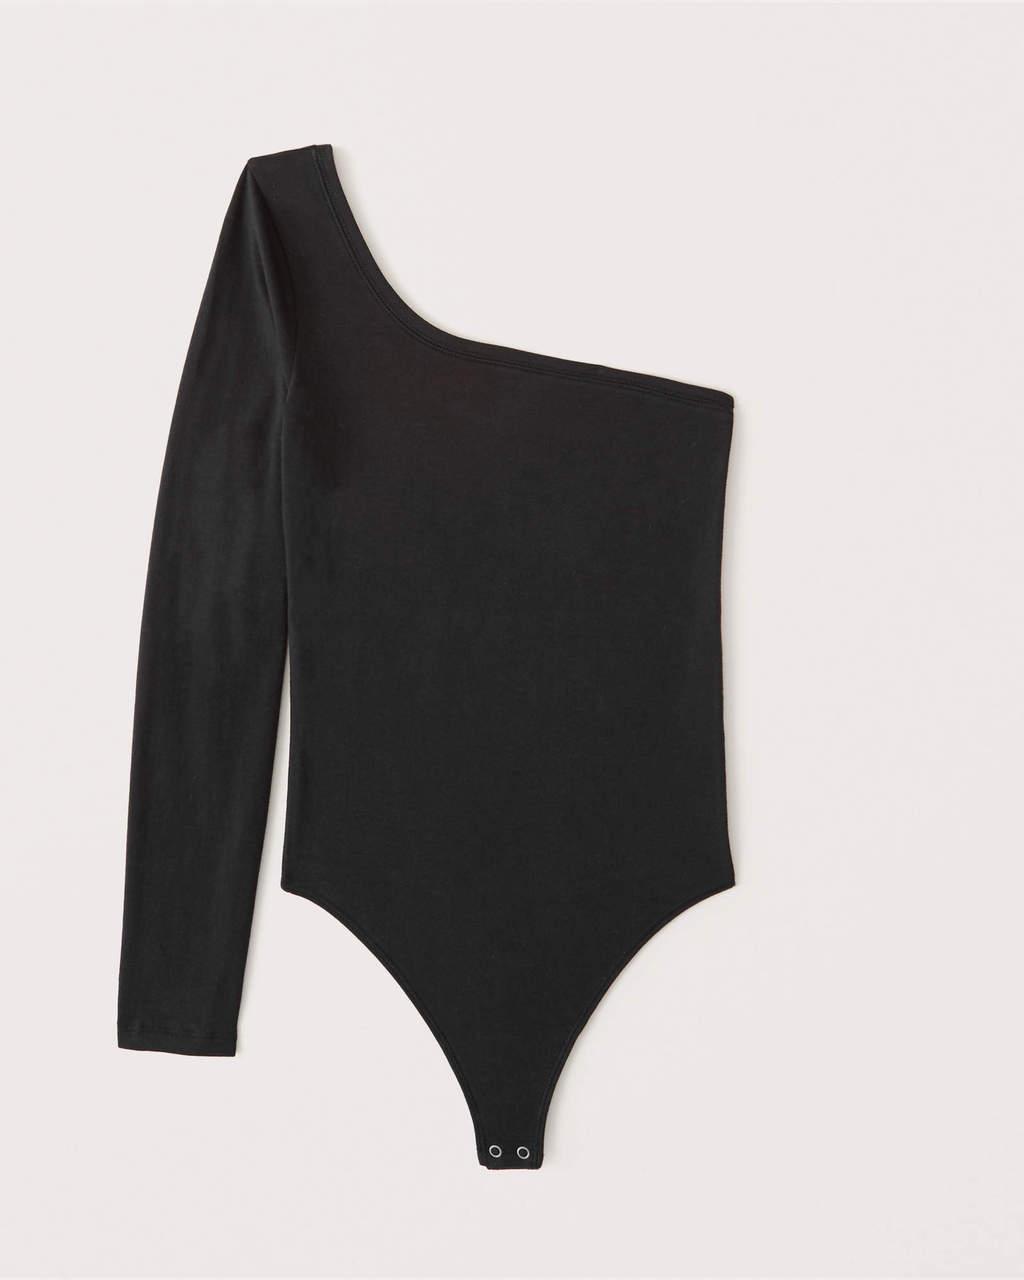 Abercrombie & Fitch Black Long-Sleeve One-Shoulder Bodysuit